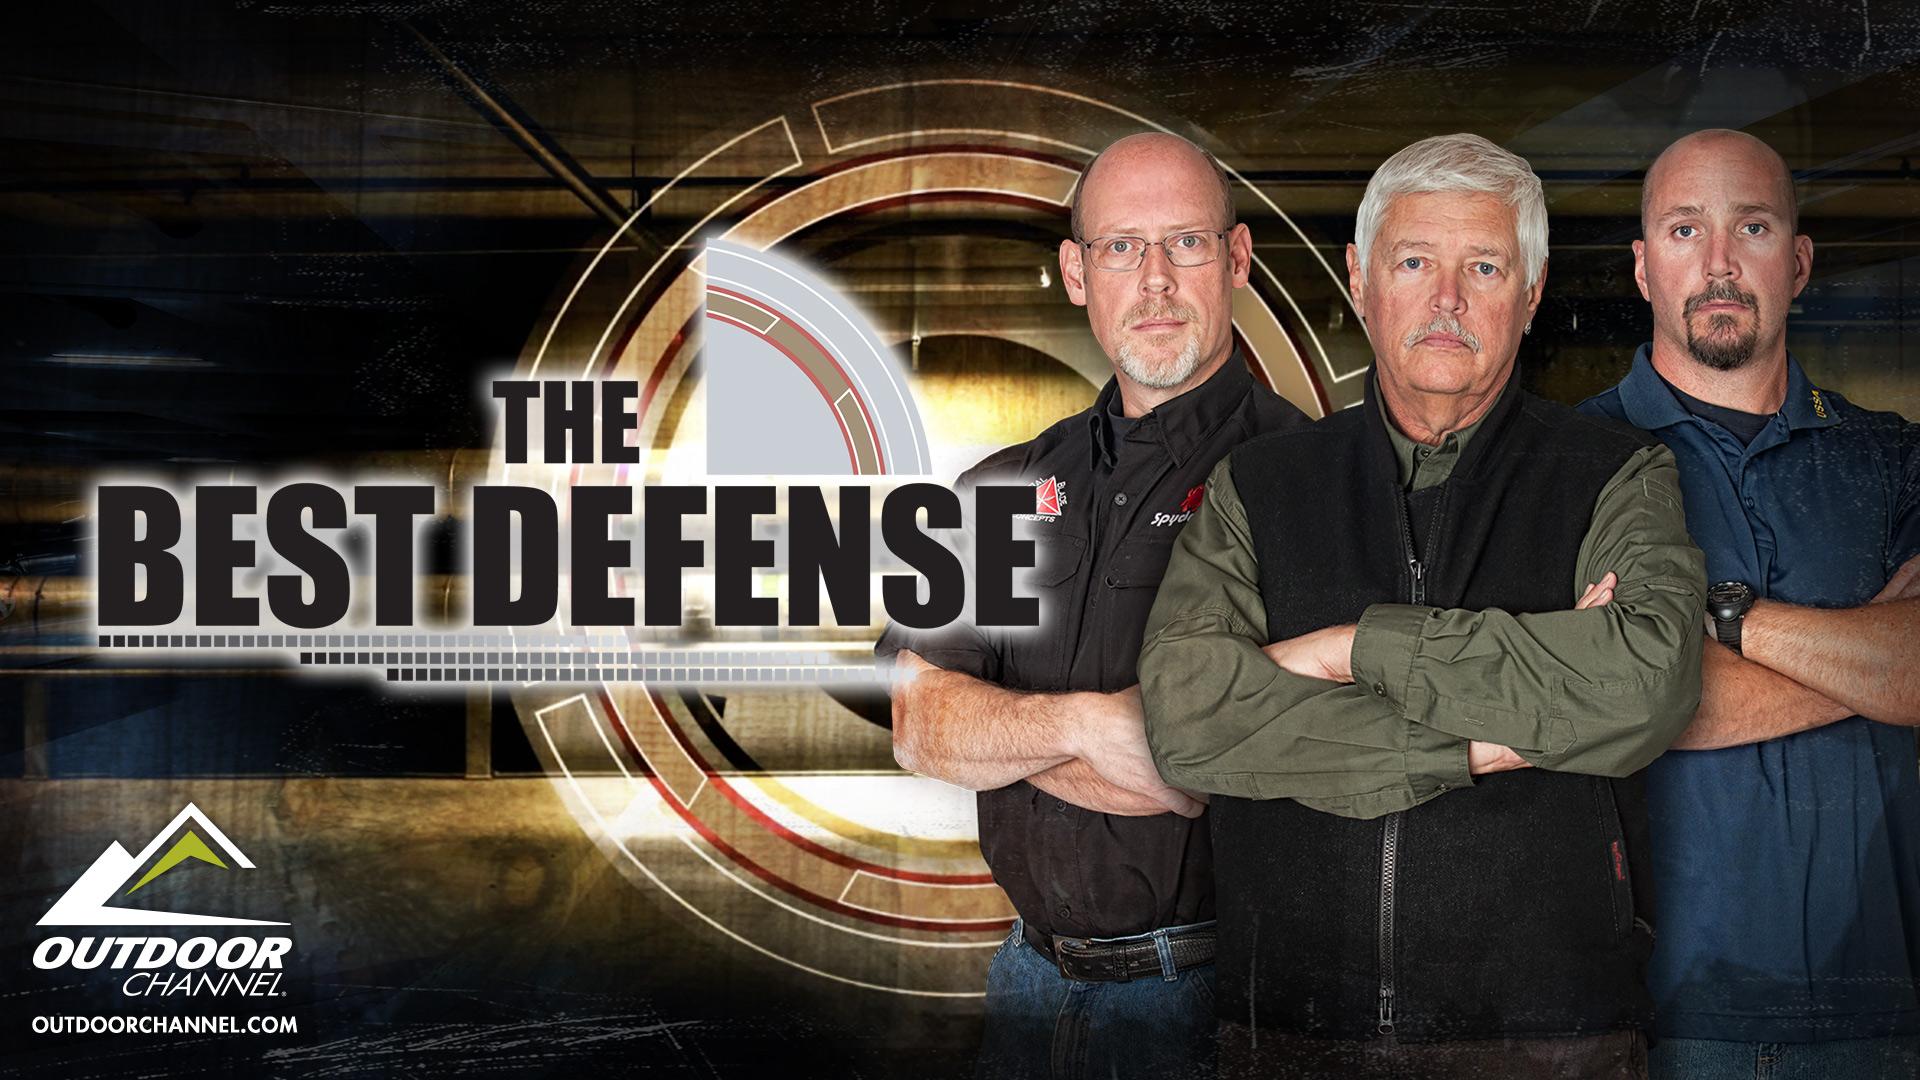 the-best-defense.jpg